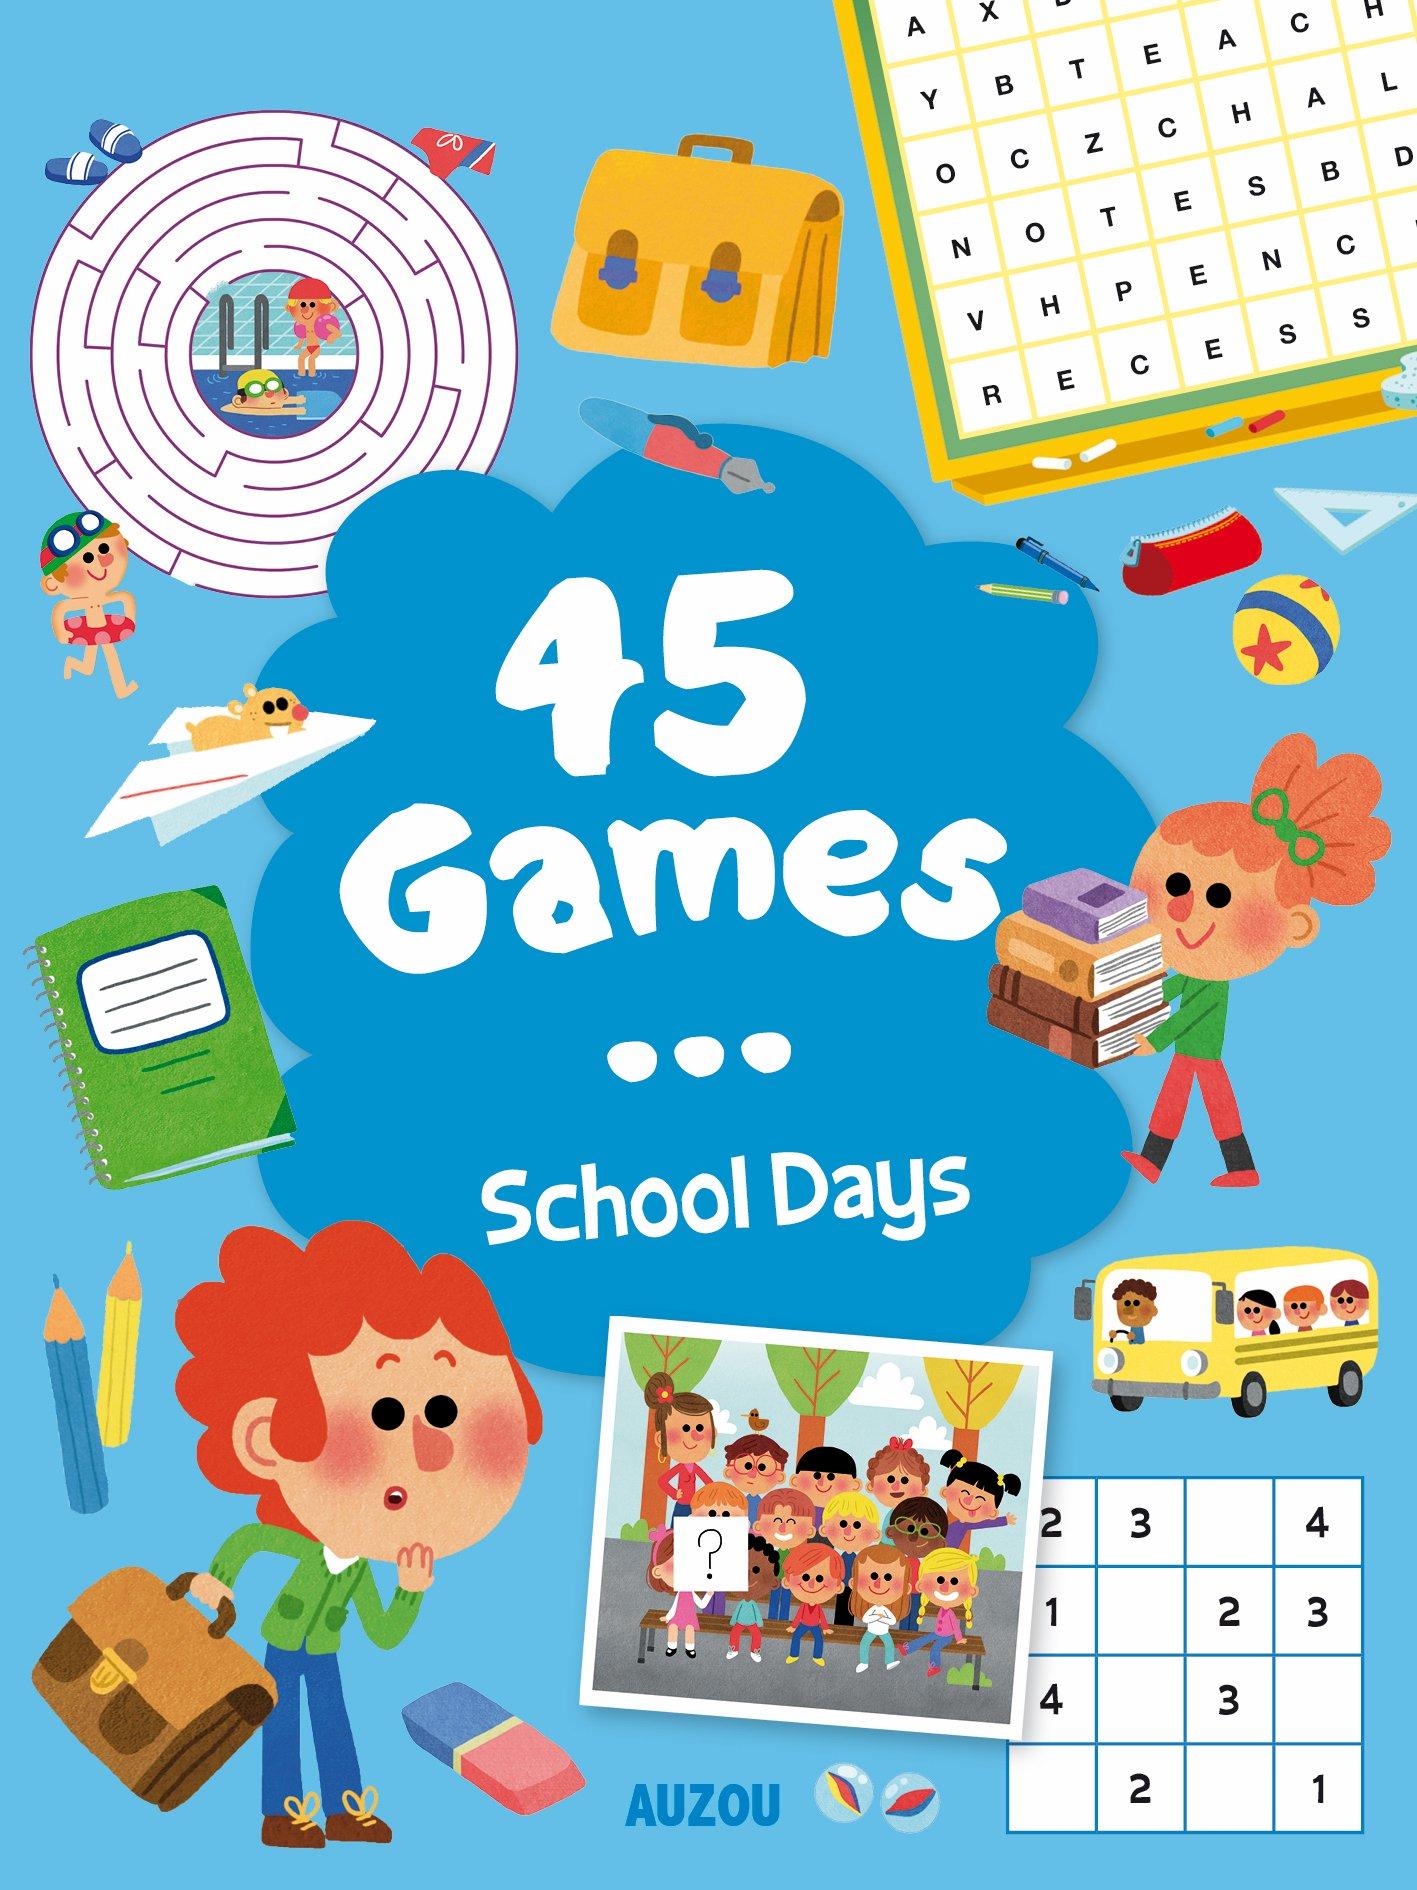 45 Games. School Days!